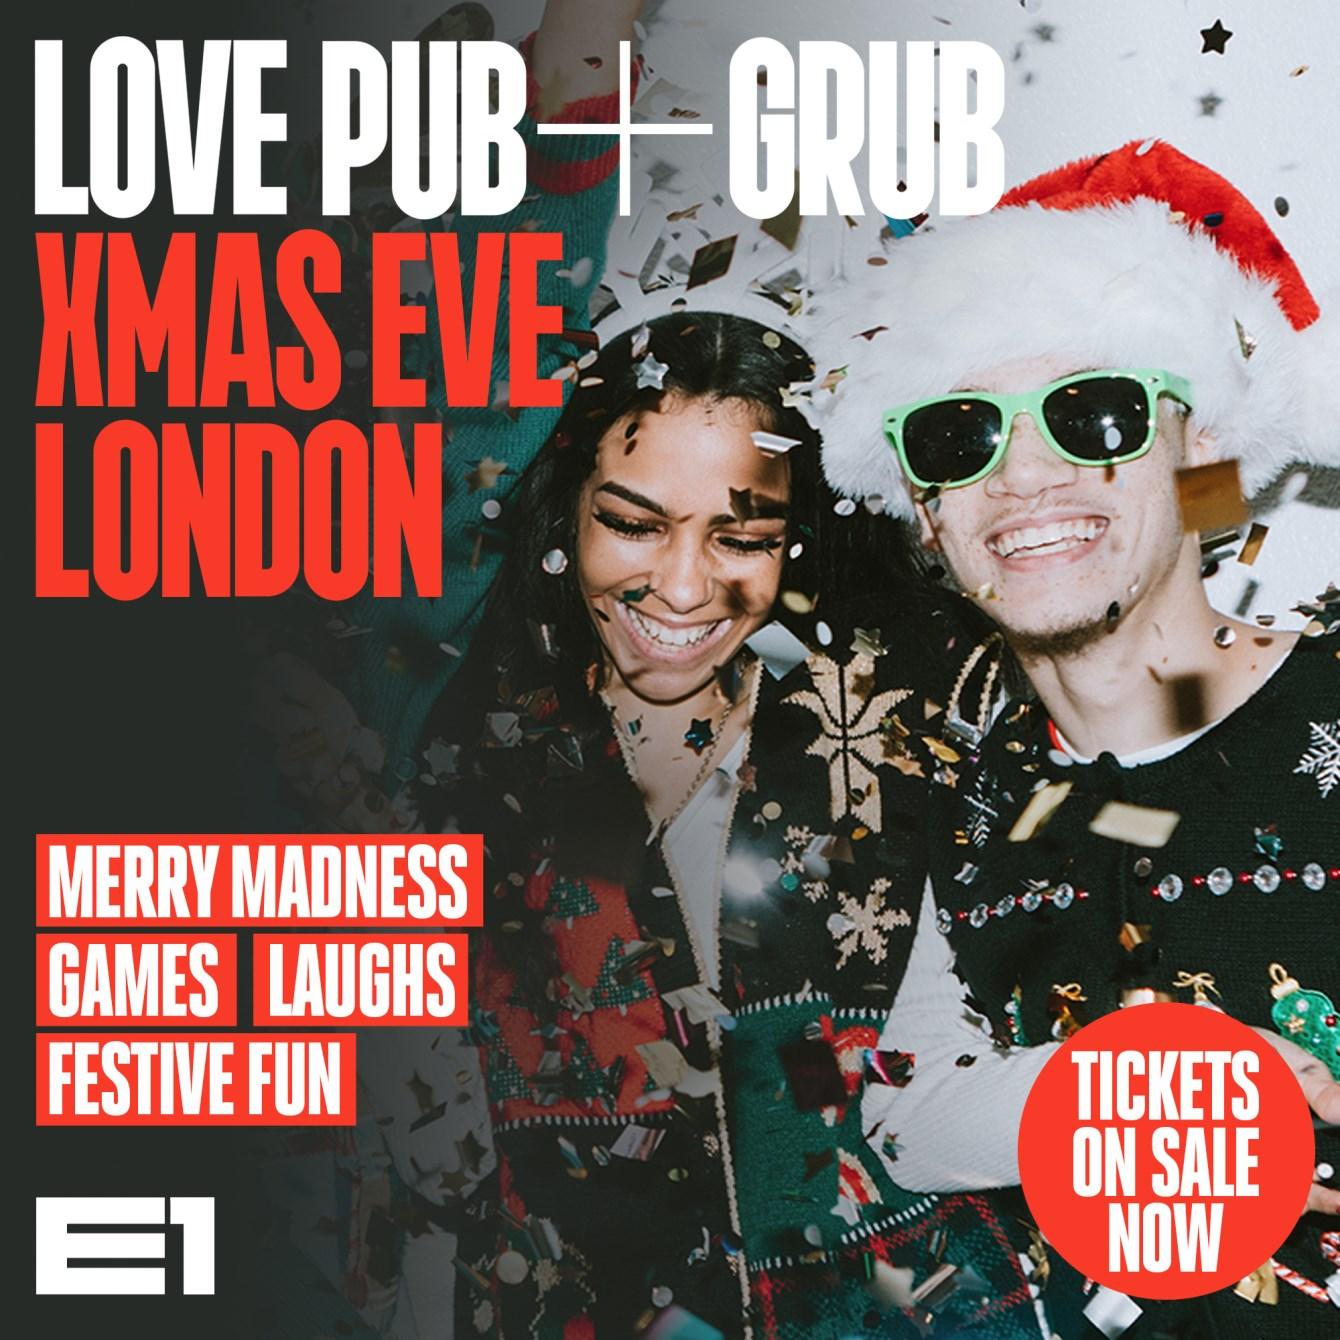 [RESCHEDULED] Love Pub + Grub - Xmas Eve Thurs 24th Dec 2020 - Flyer front